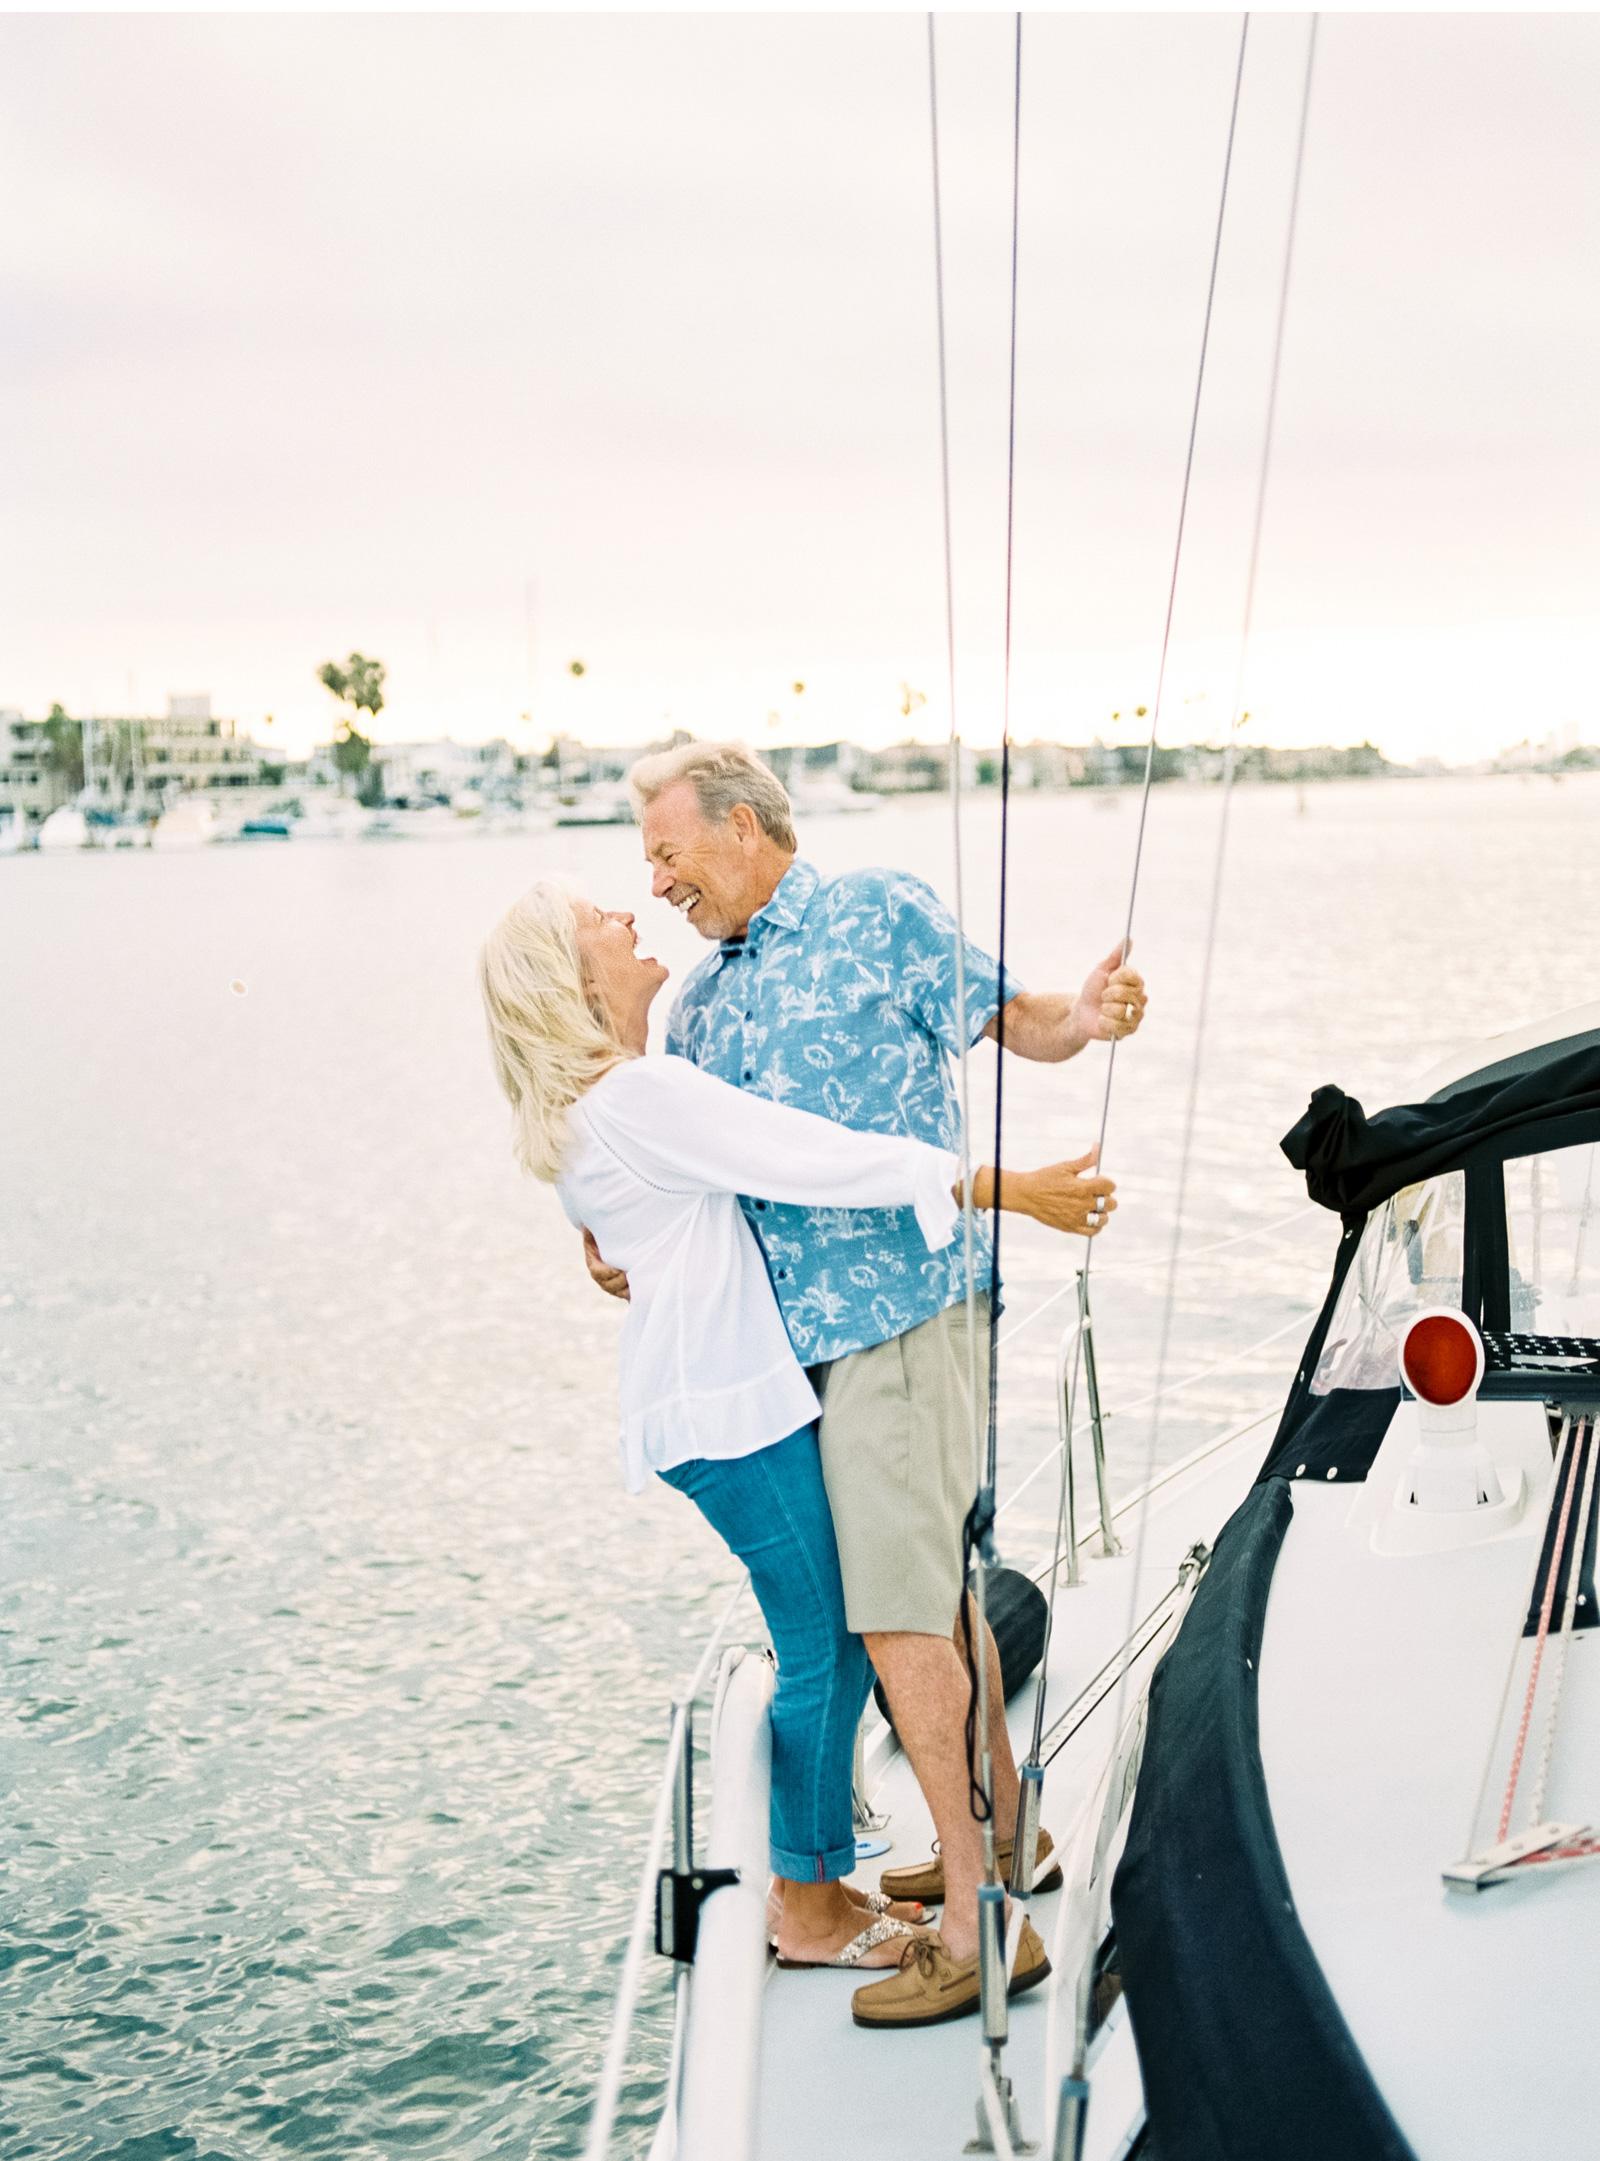 Anniversaries-on-the-Water-Long-Beach-Anniversary-Southern-California-Wedding-Photographer-Fine-Art-Wedding-Photos-Anniversary-on-Boat-Natalie-Schutt-Photography_10.jpg